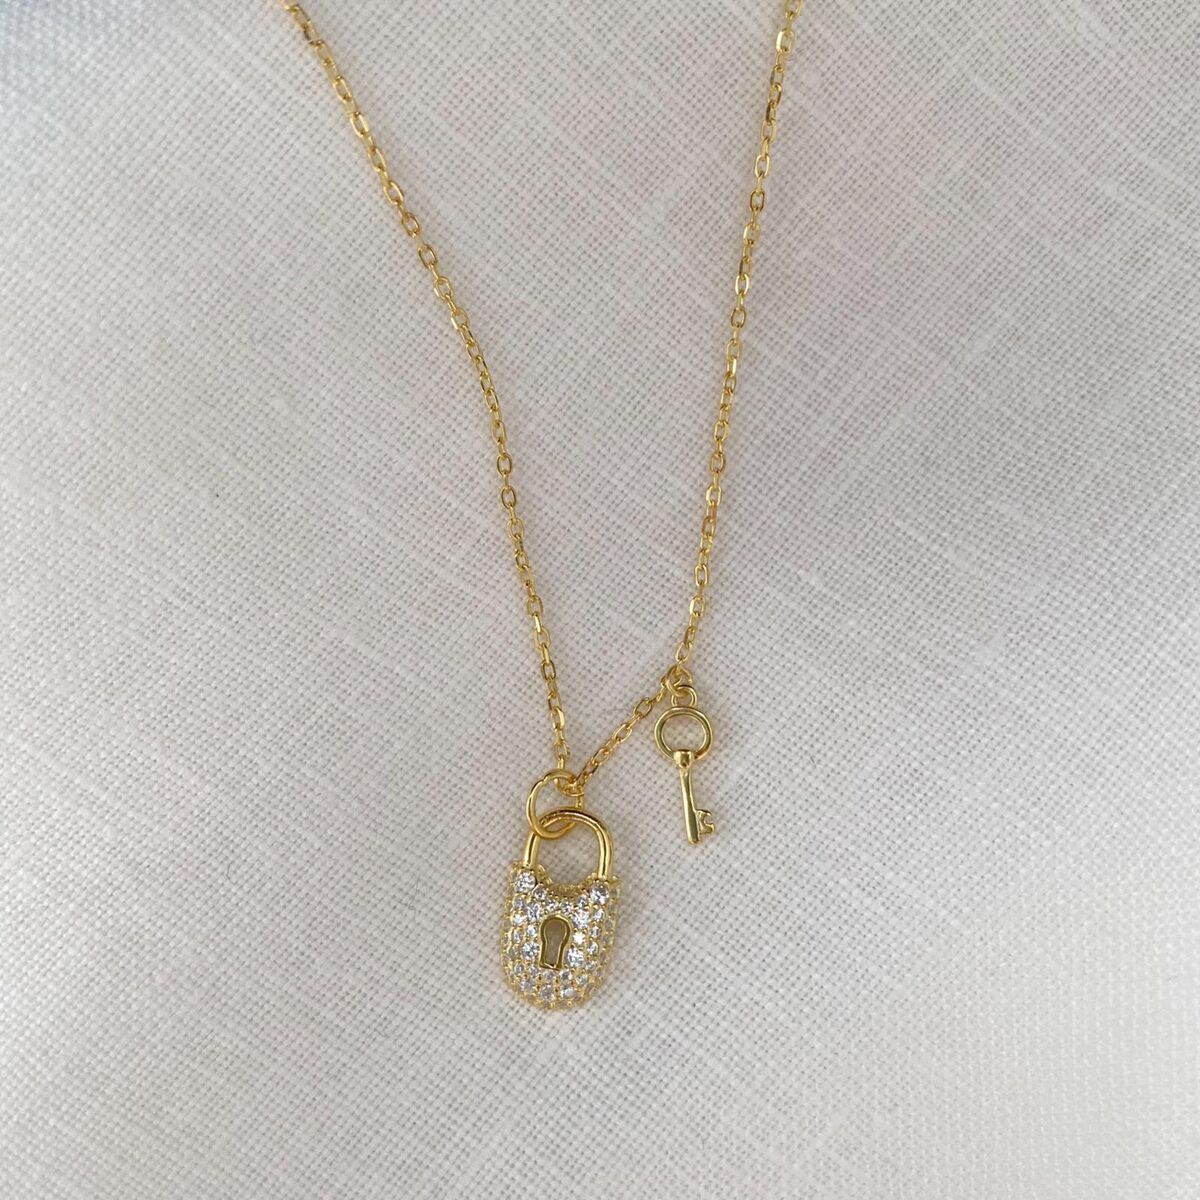 Taşlı Anahtarlı Kilit Kolye   925 Gümüş